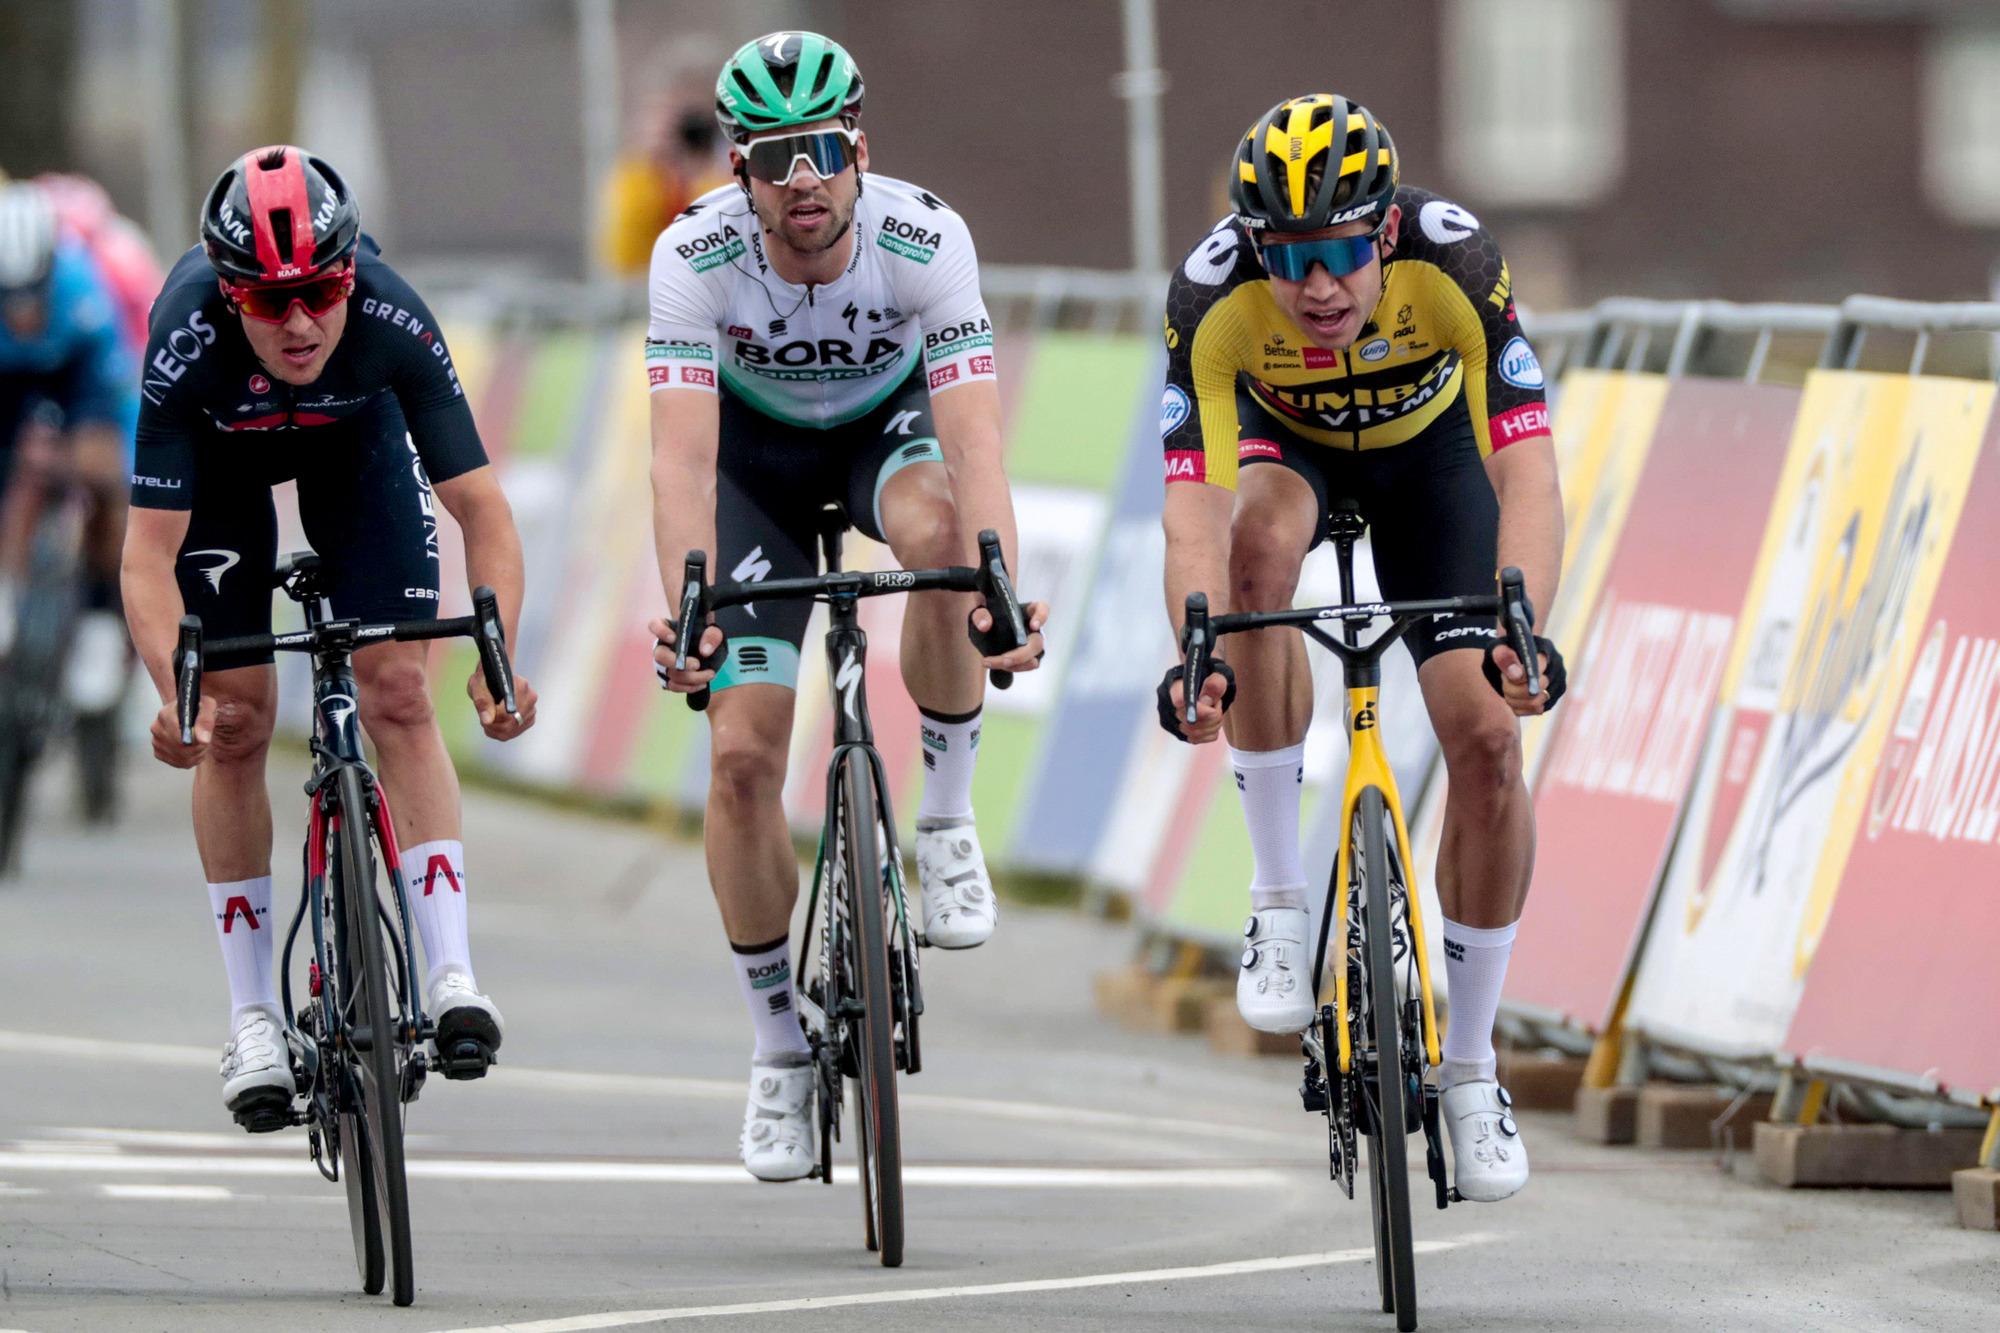 Amstel Gold Race 2021 - 55th Edition - Valkenburg - Berg en Terblijt 218,6 km - 18/04/2021 - Wout Van Aert (BEL - Jumbo - Visma) - Tom Pidcock (GBR - Ineos Grenadiers) - Maximilian Schachmann (GER - Bora - Hansgrohe) - photo Davy Rietbergen/CV/BettiniPhoto©2021